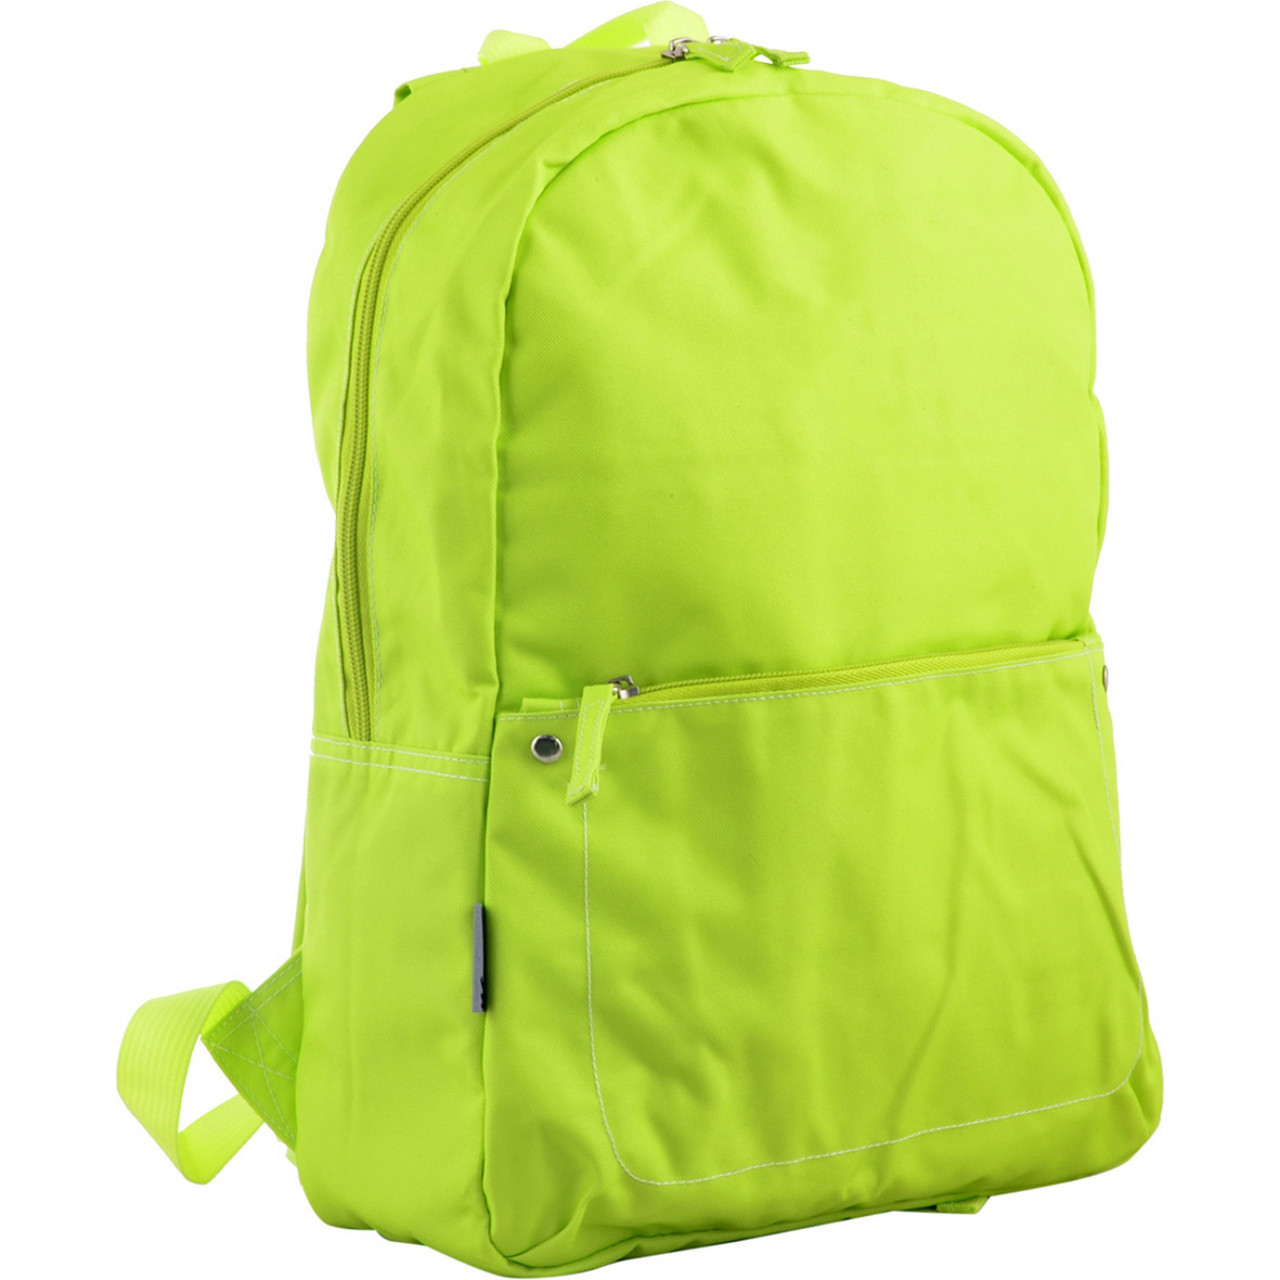 Рюкзак городской YES  ST-21 Green apple, 40*26.5*12 код: 555528